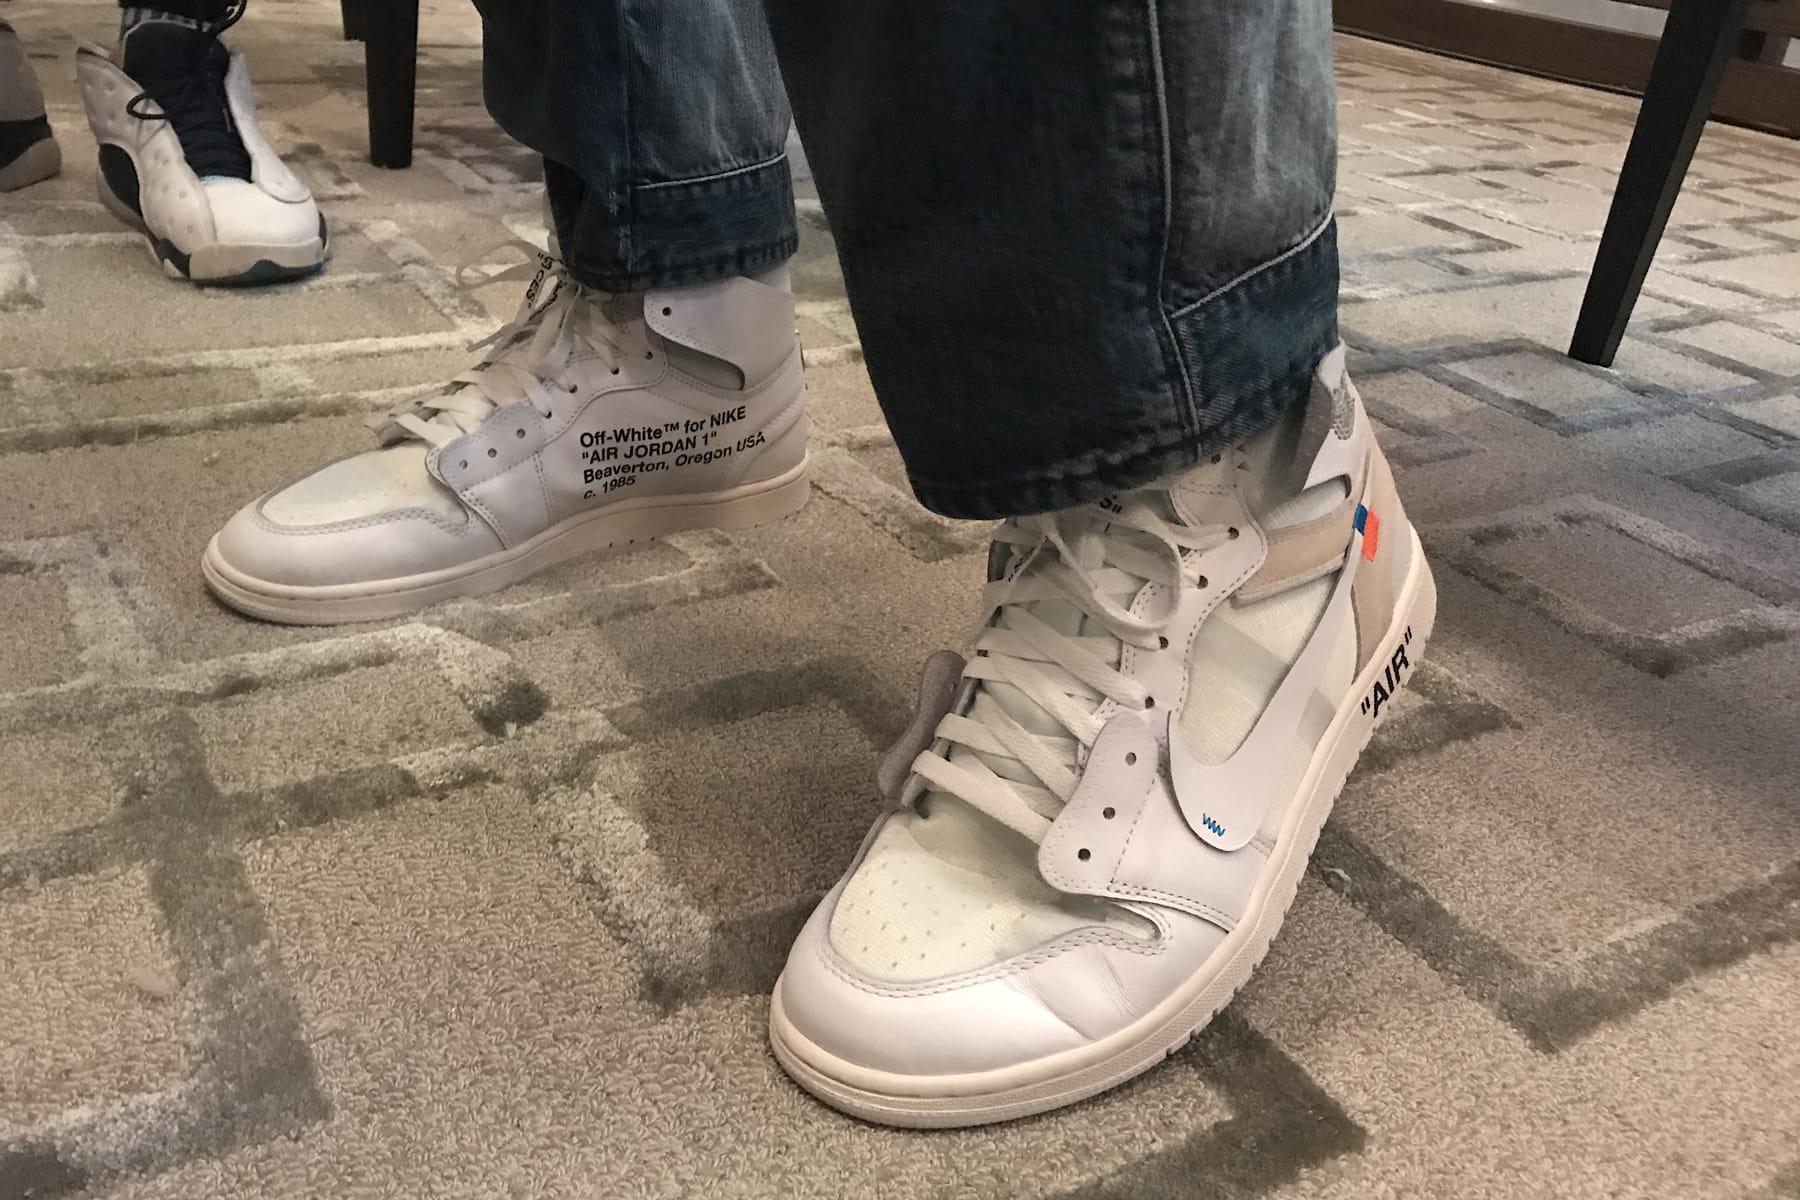 Off-White x Nike Air Jordan 1 White